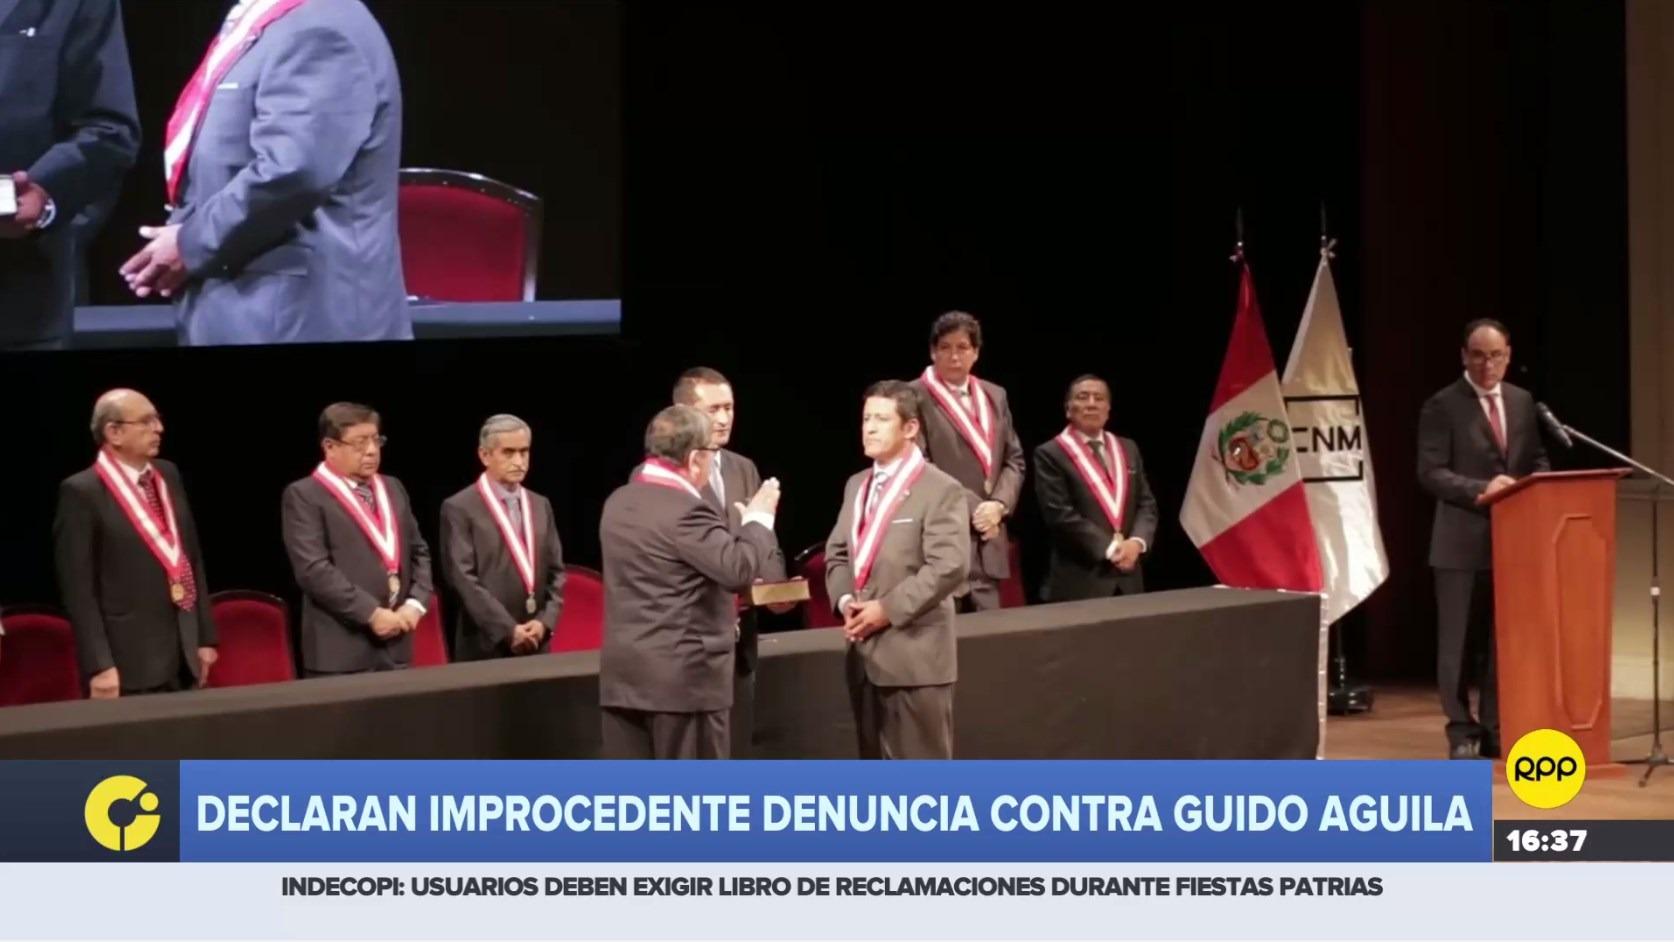 Declaran improcedentes denuncias contra Guido Aguila.